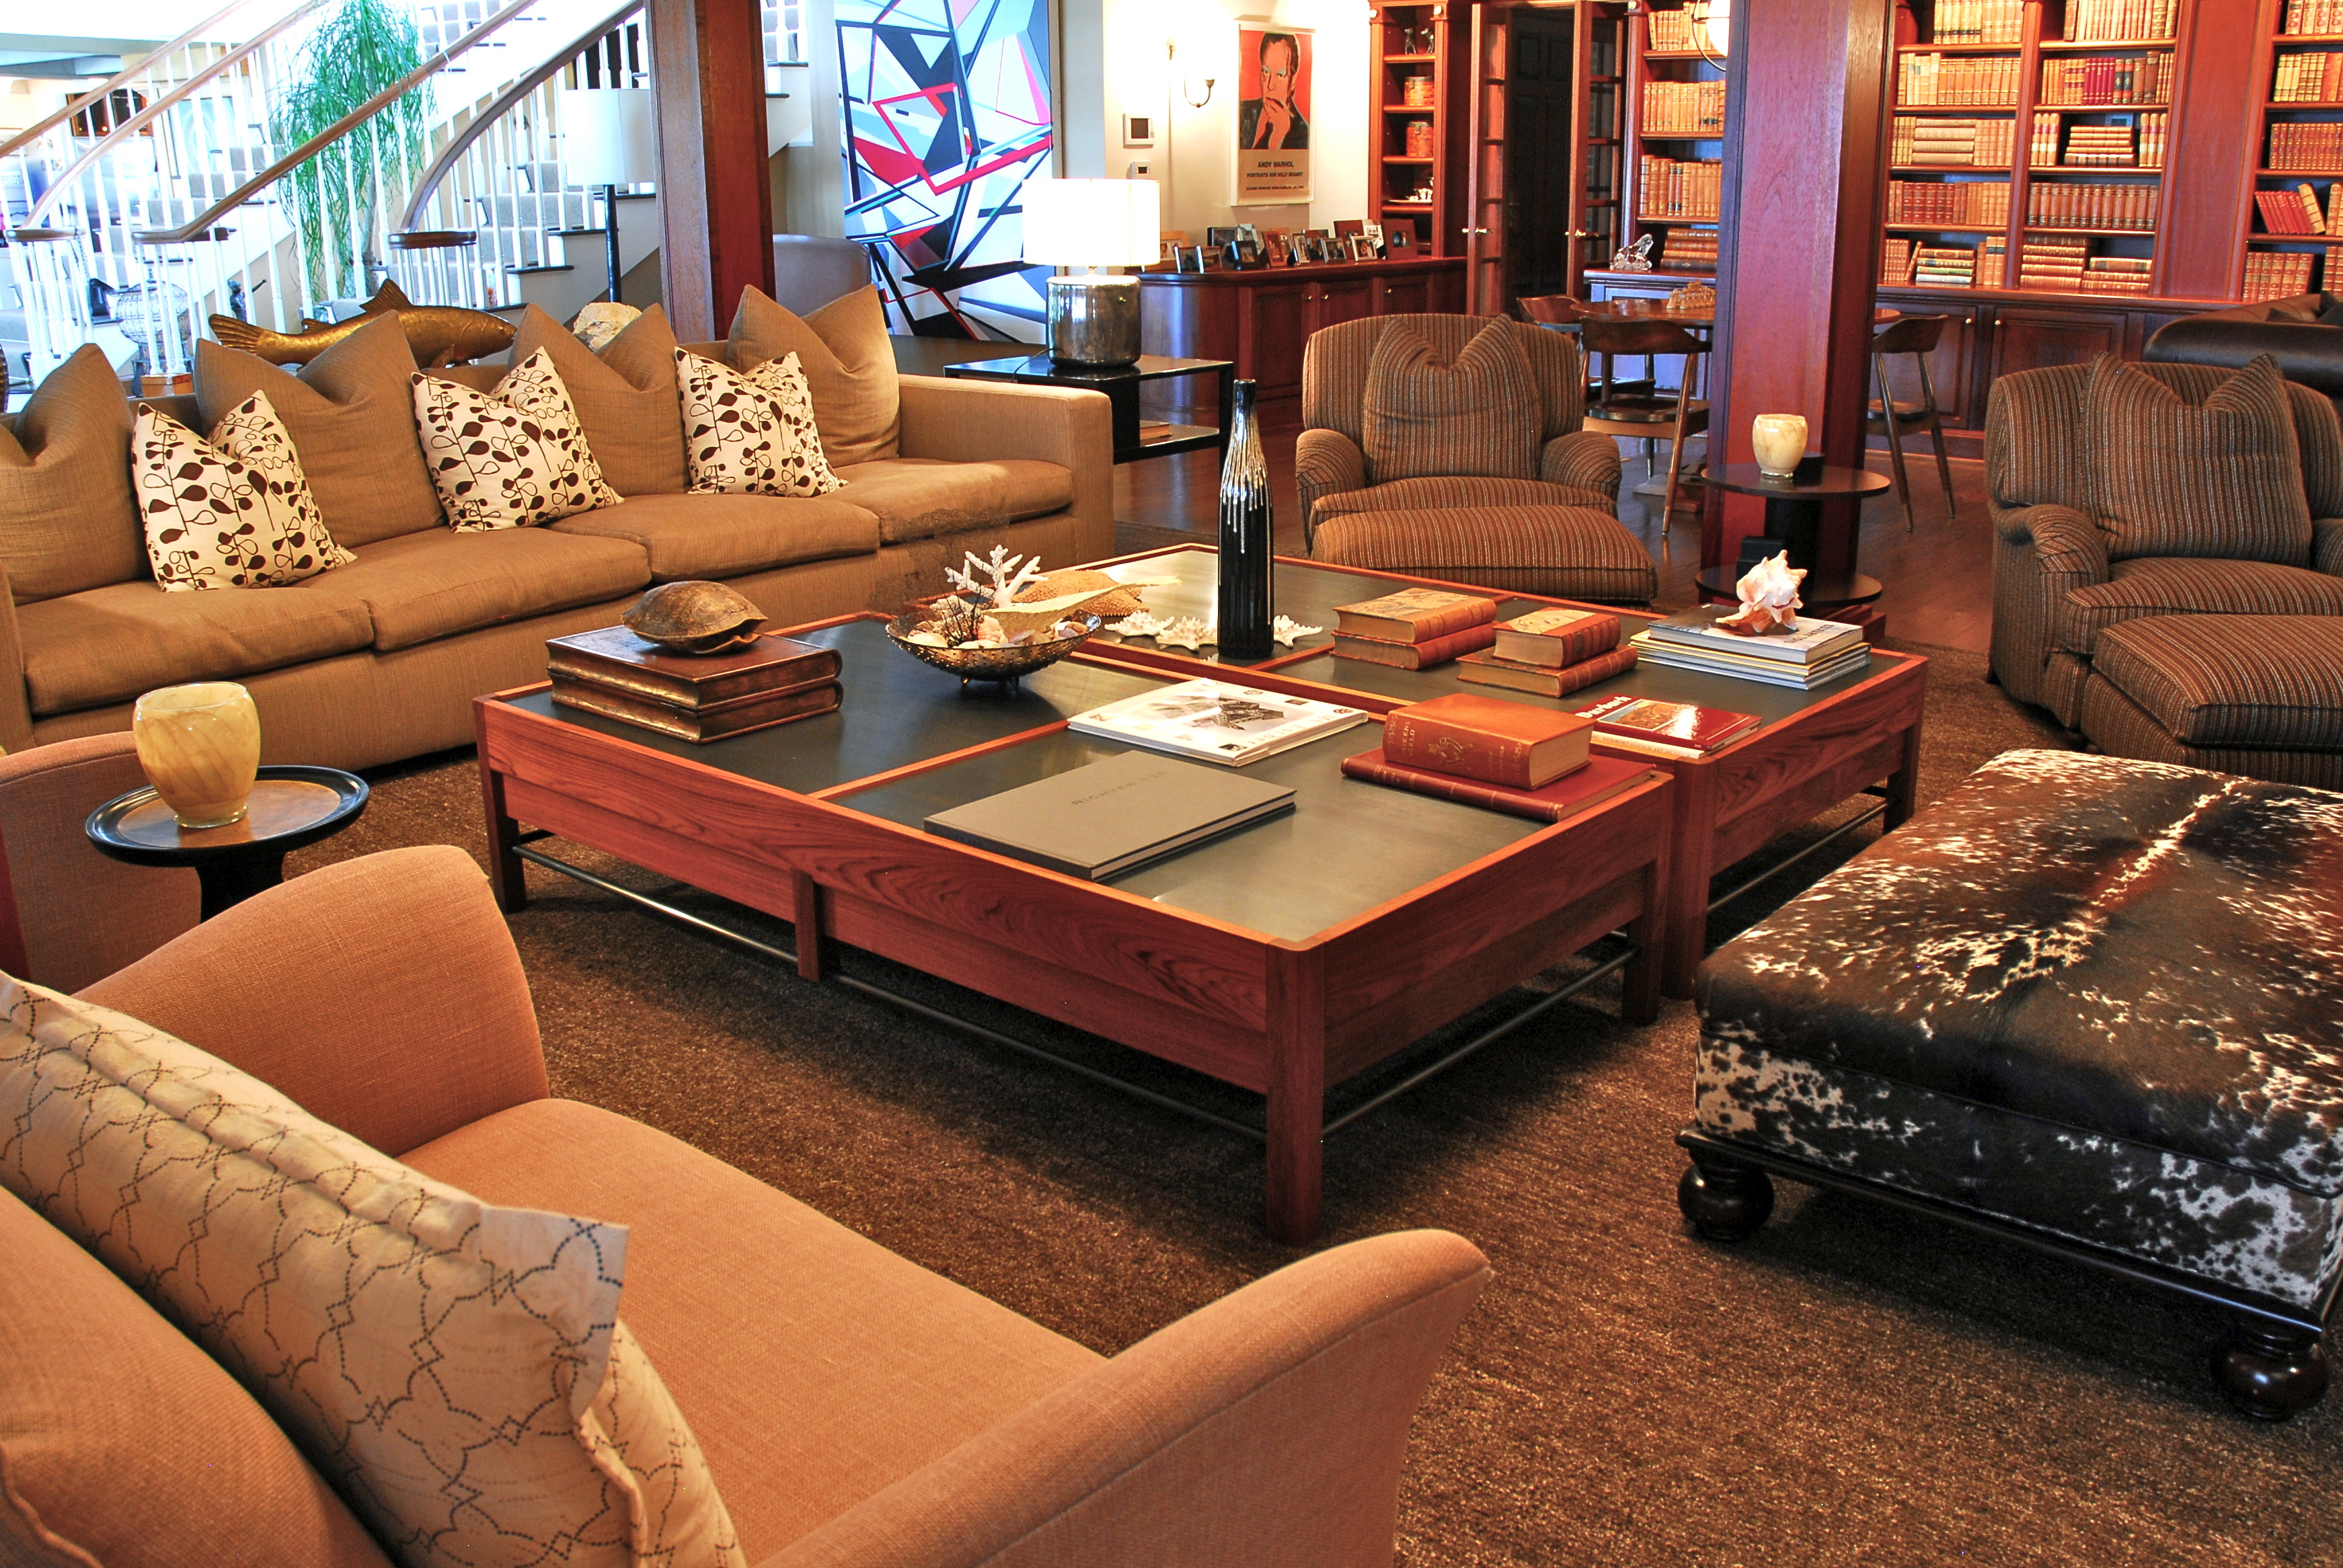 New Kdhamptons Designer Diary Meet Bespoke Furniture Designer Matthew Isom Kdhamptons